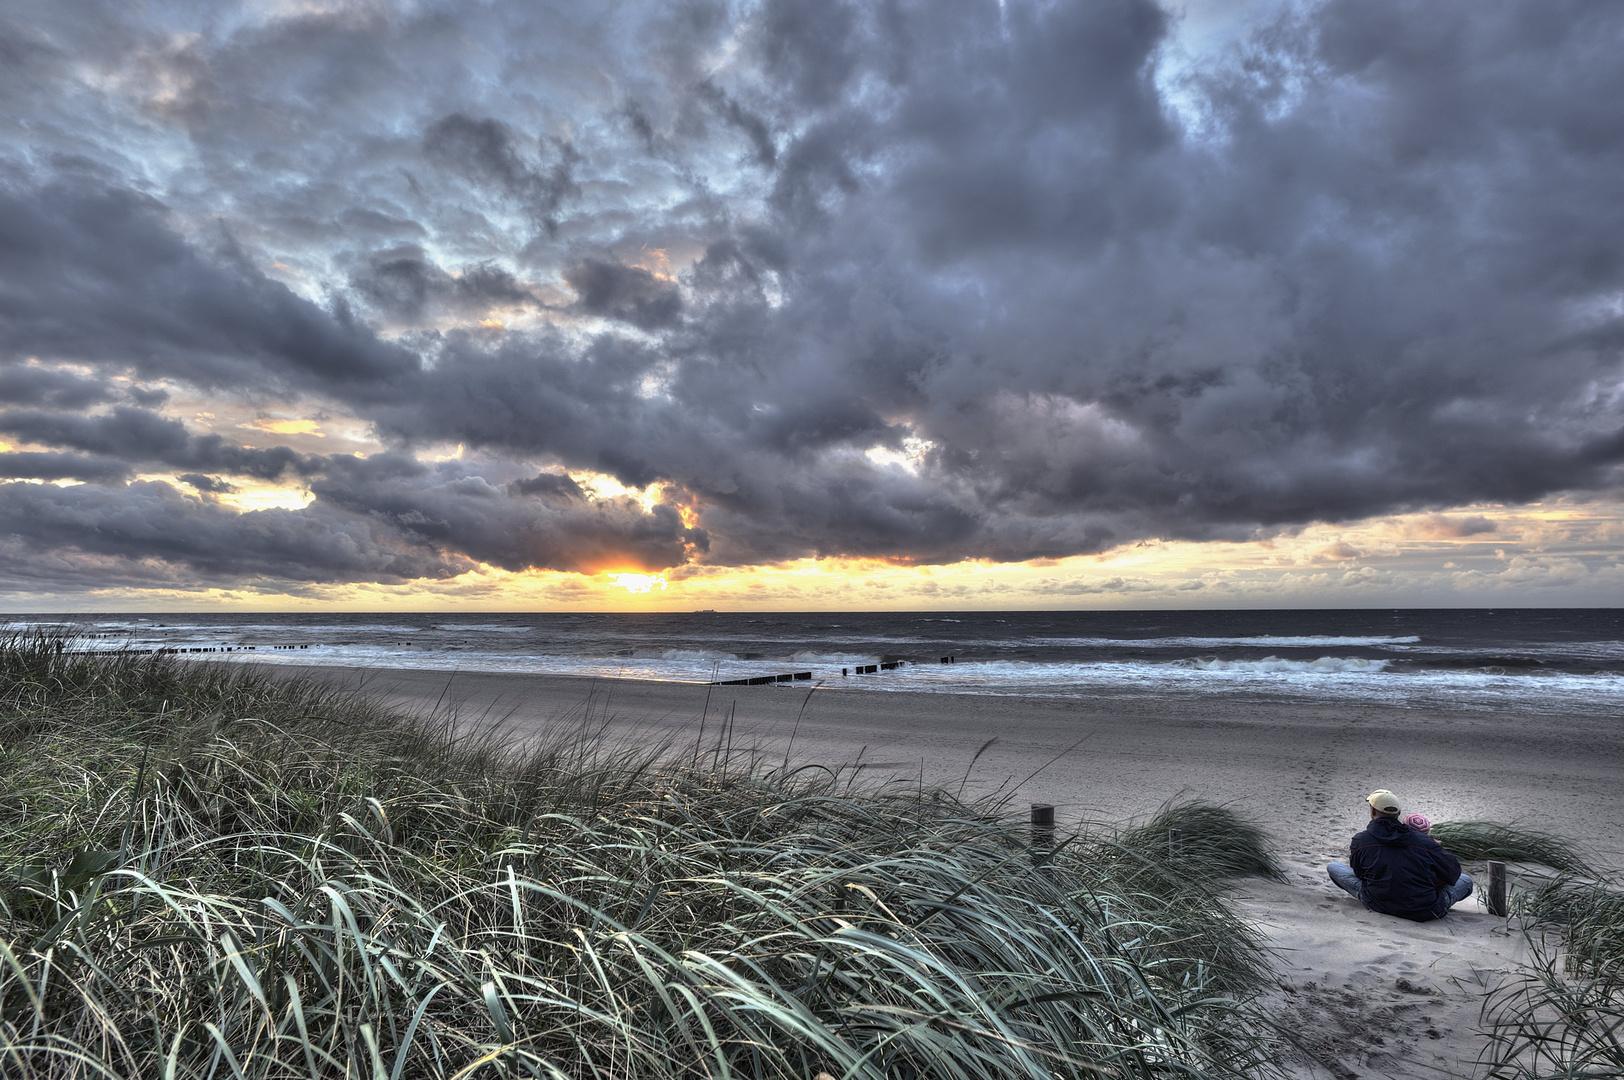 Sonnenuntergang an der Ostsee in der Rostocker Heide